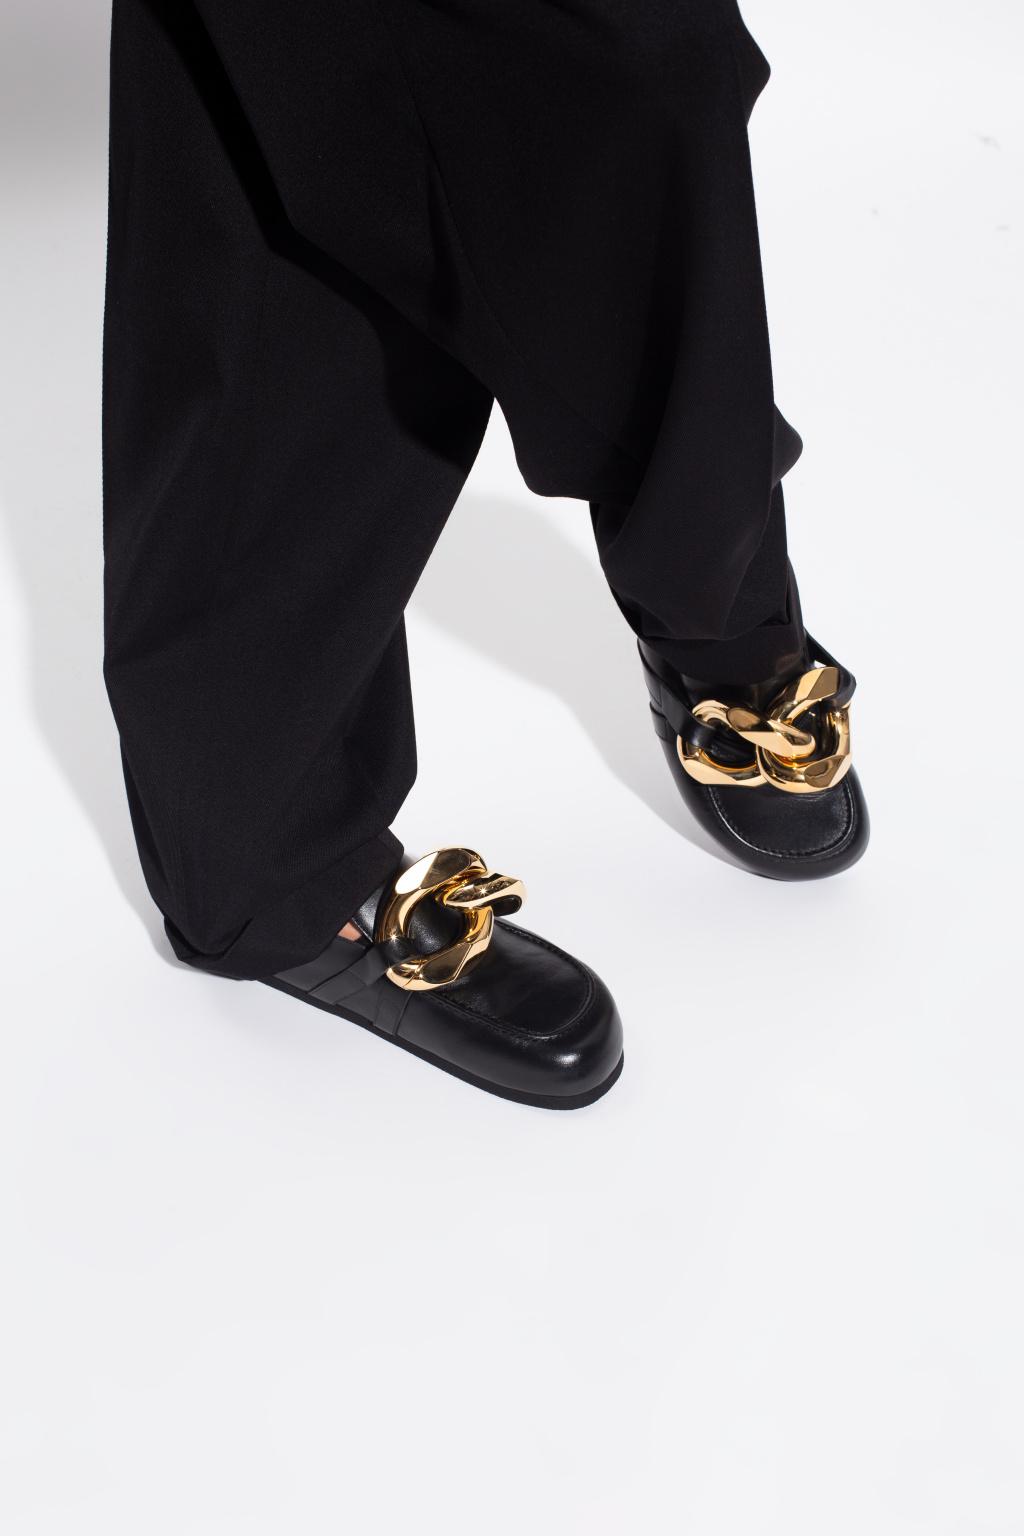 J.W. Anderson Leather slides